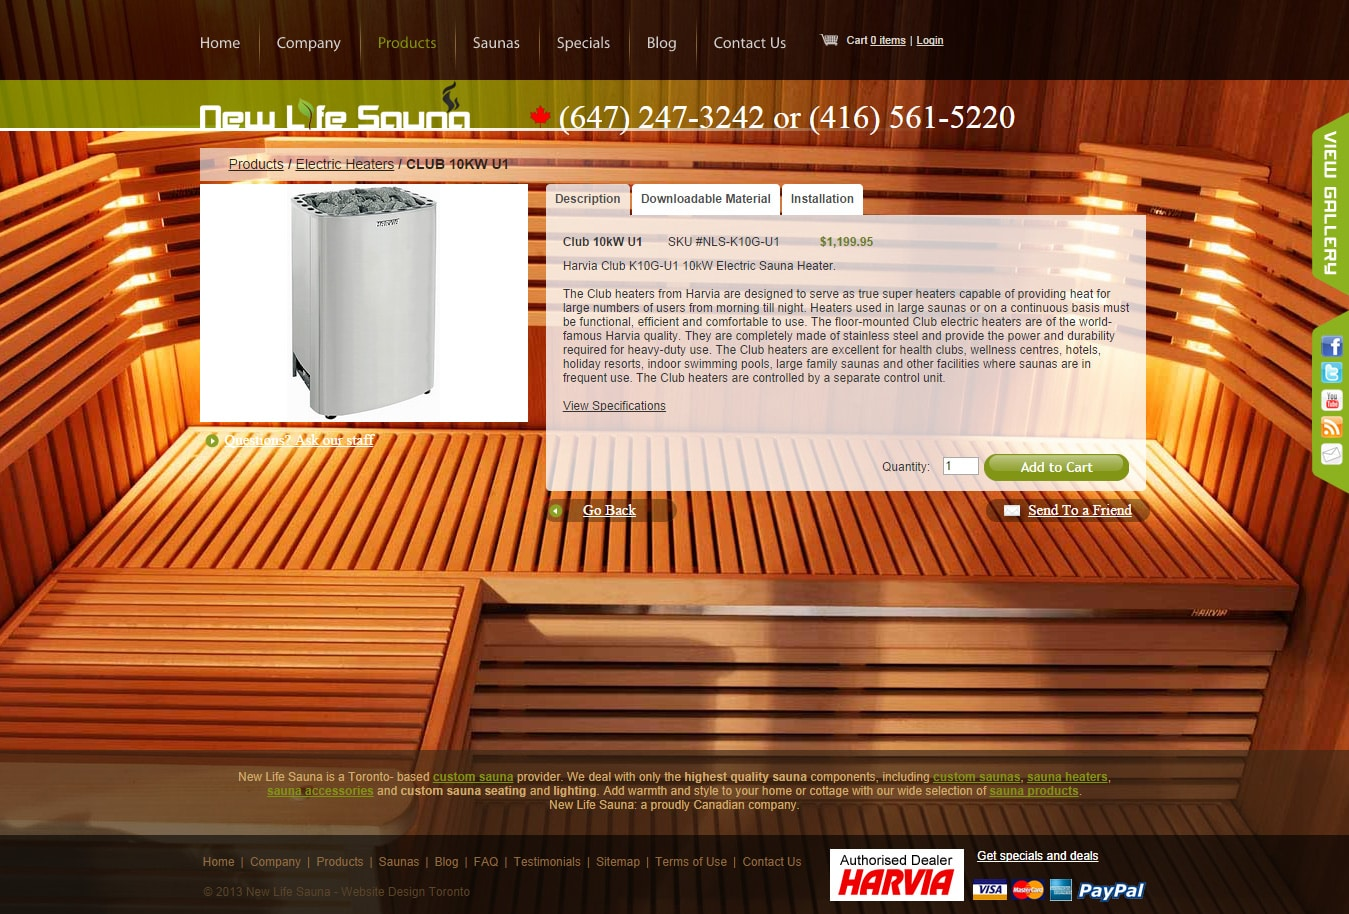 New Life Sauna Products